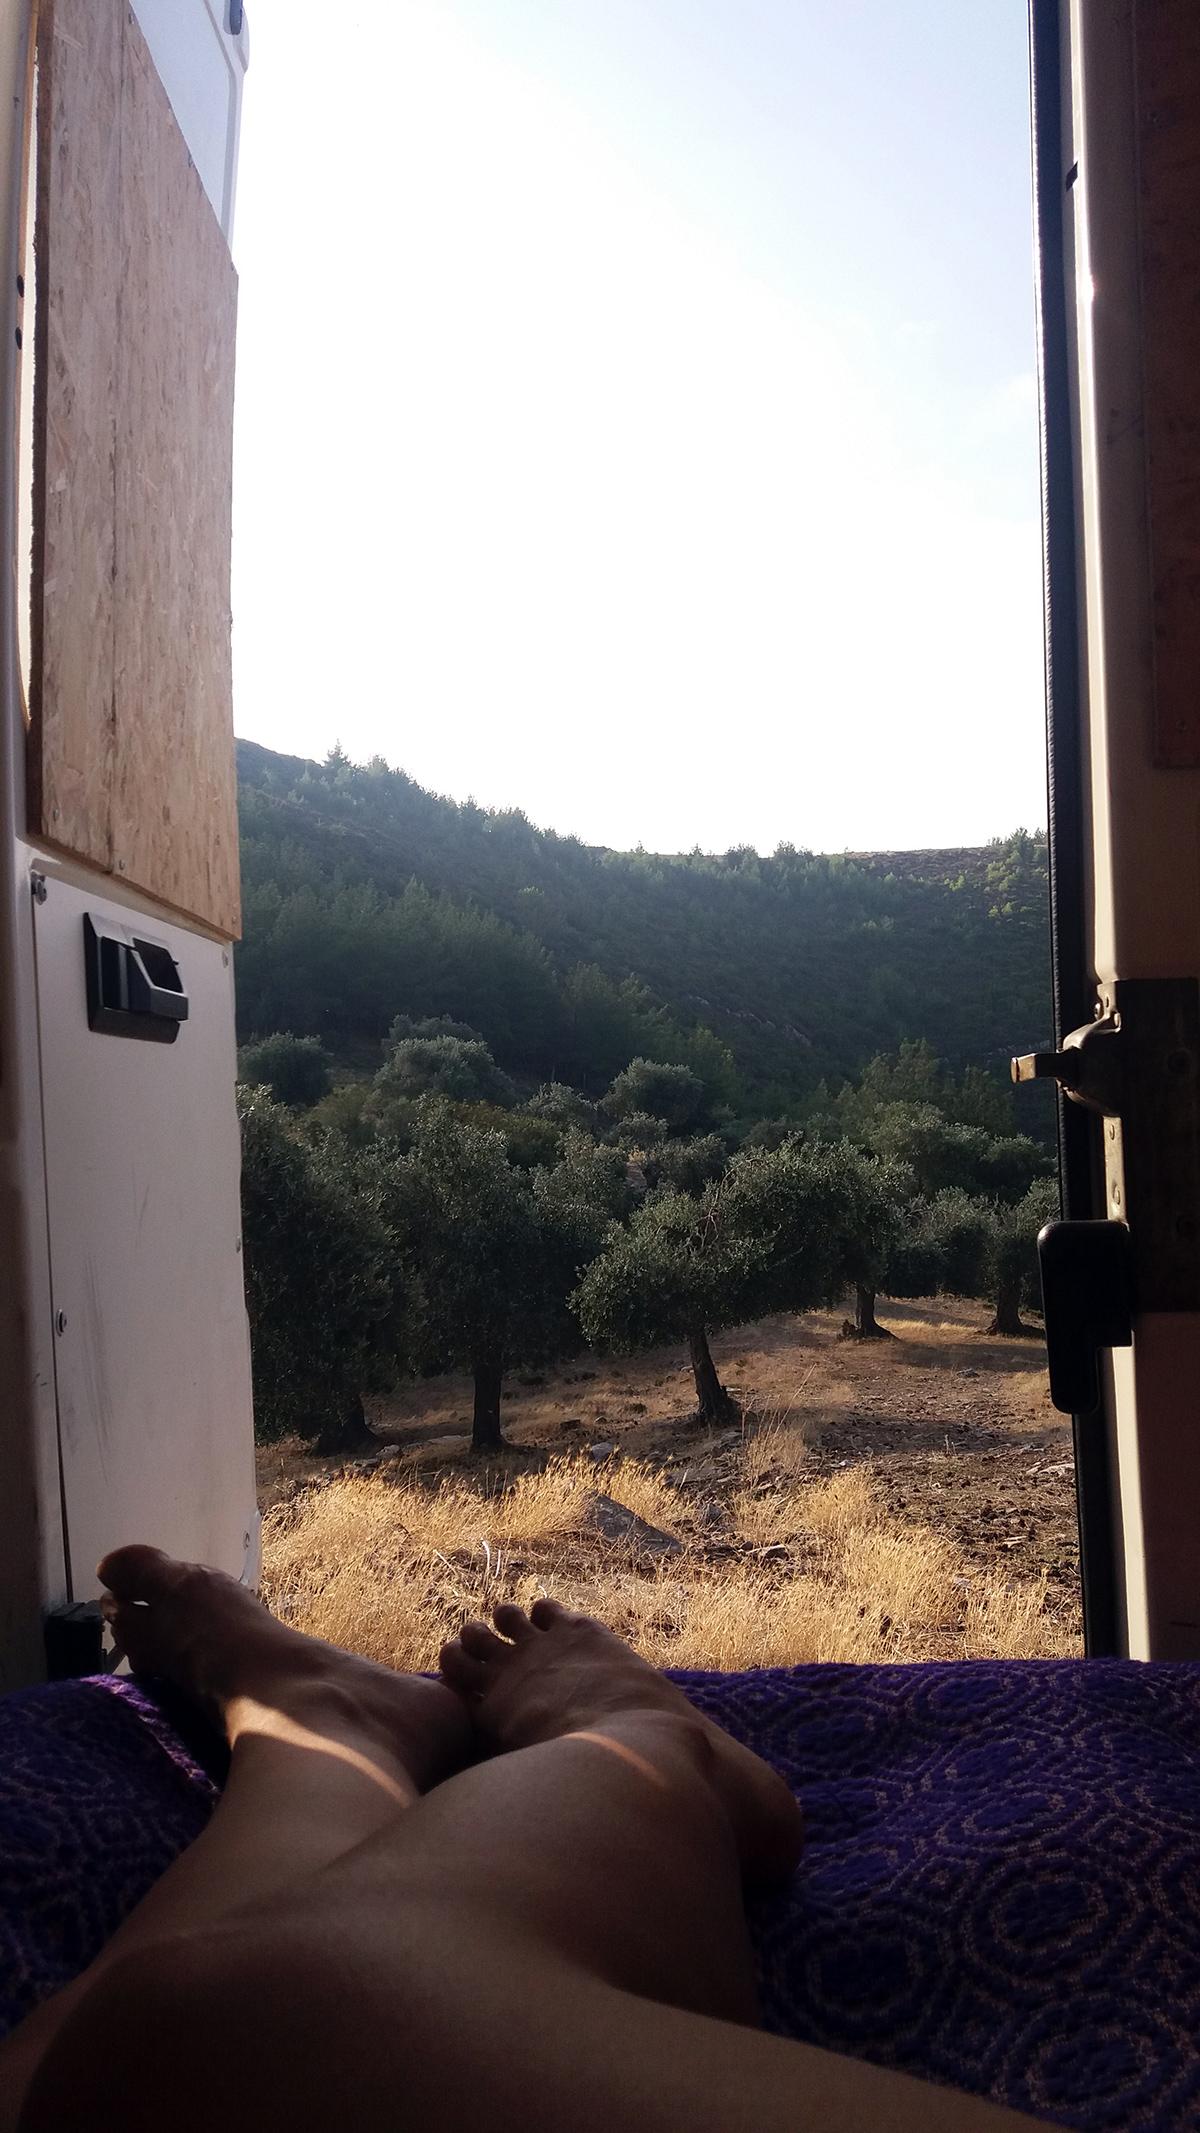 6 Things We Learned from Our First Camper Van Trip in Greece #vanlife #travel #europe #outdoors #nature #van #campervan #greece